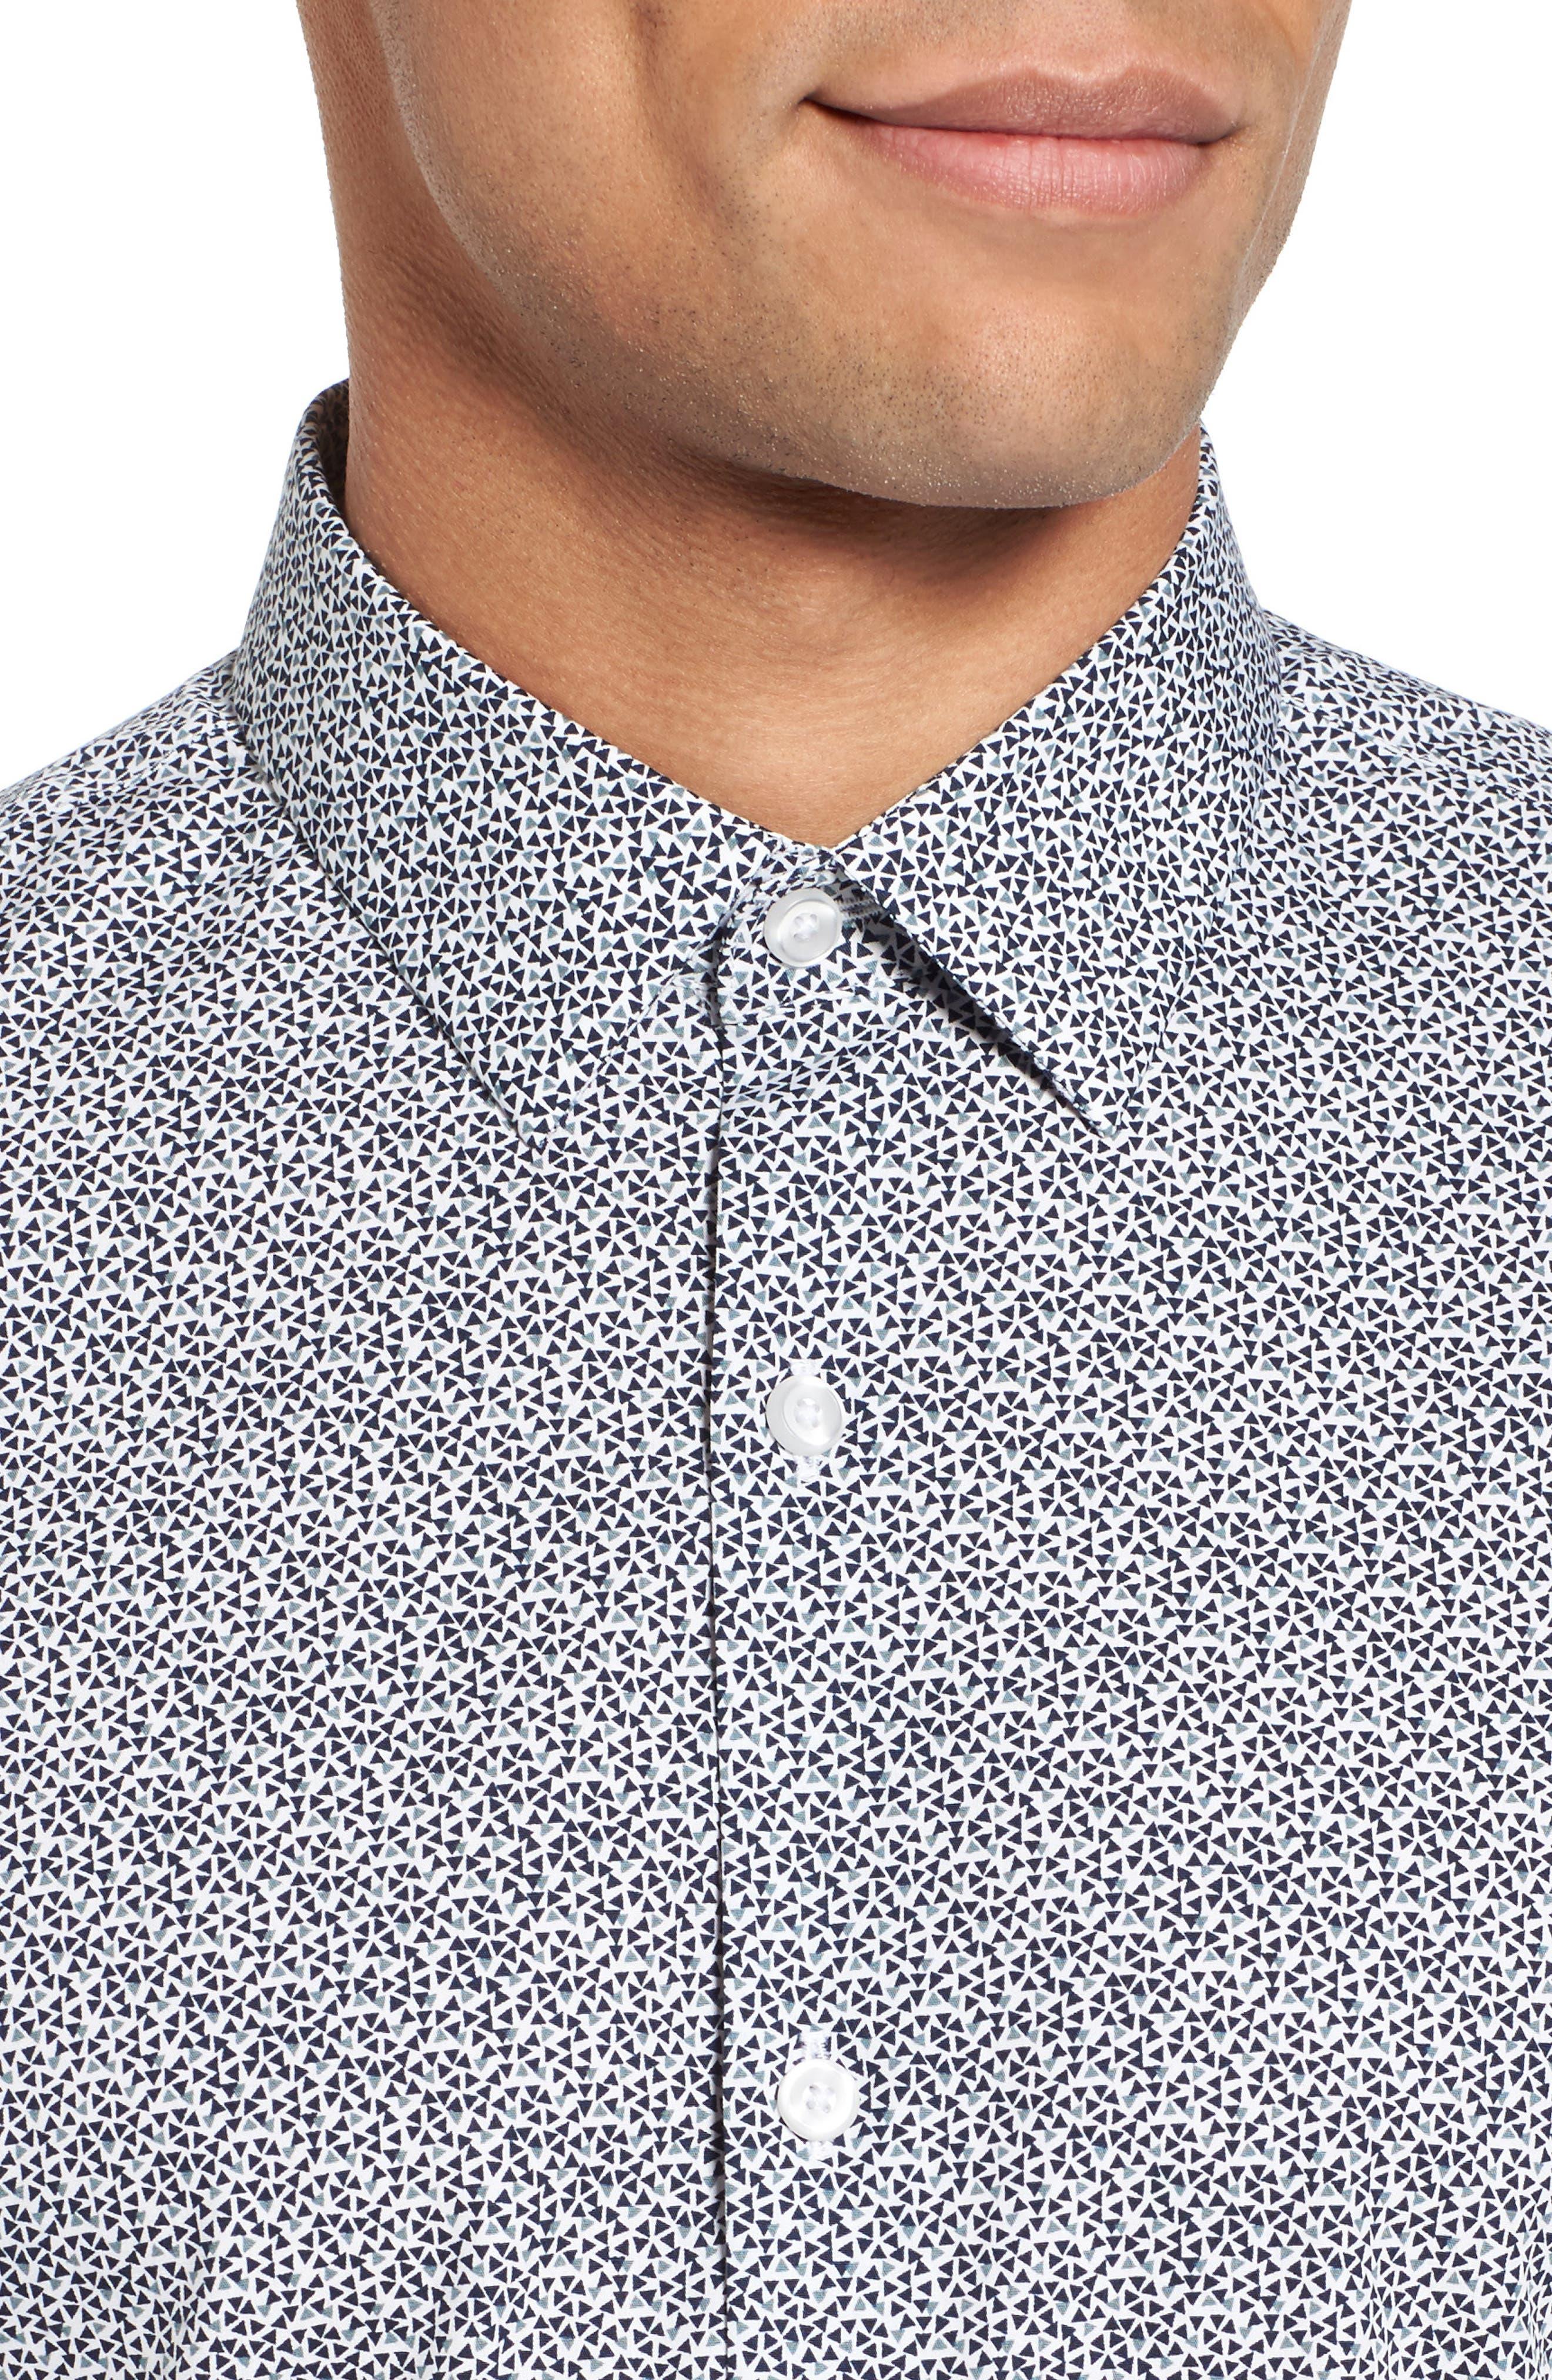 Trim Fit Geometric Sport Shirt,                             Alternate thumbnail 4, color,                             410